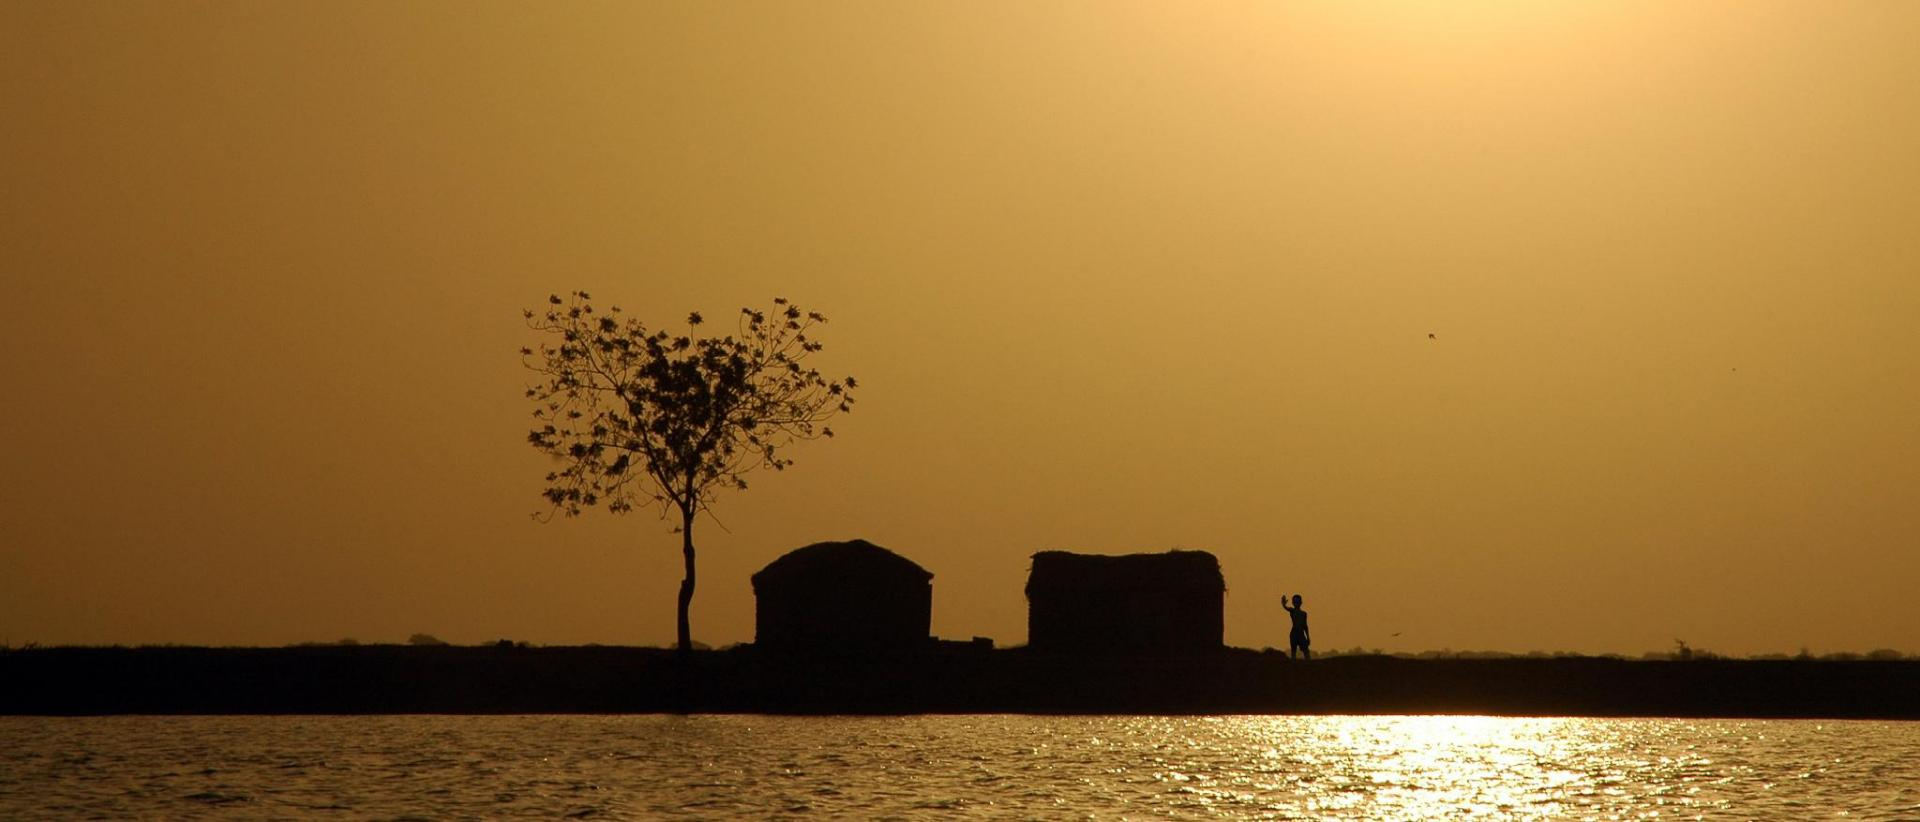 173920 7x3 - Hotels Close To Agodi Gardens Ibadan